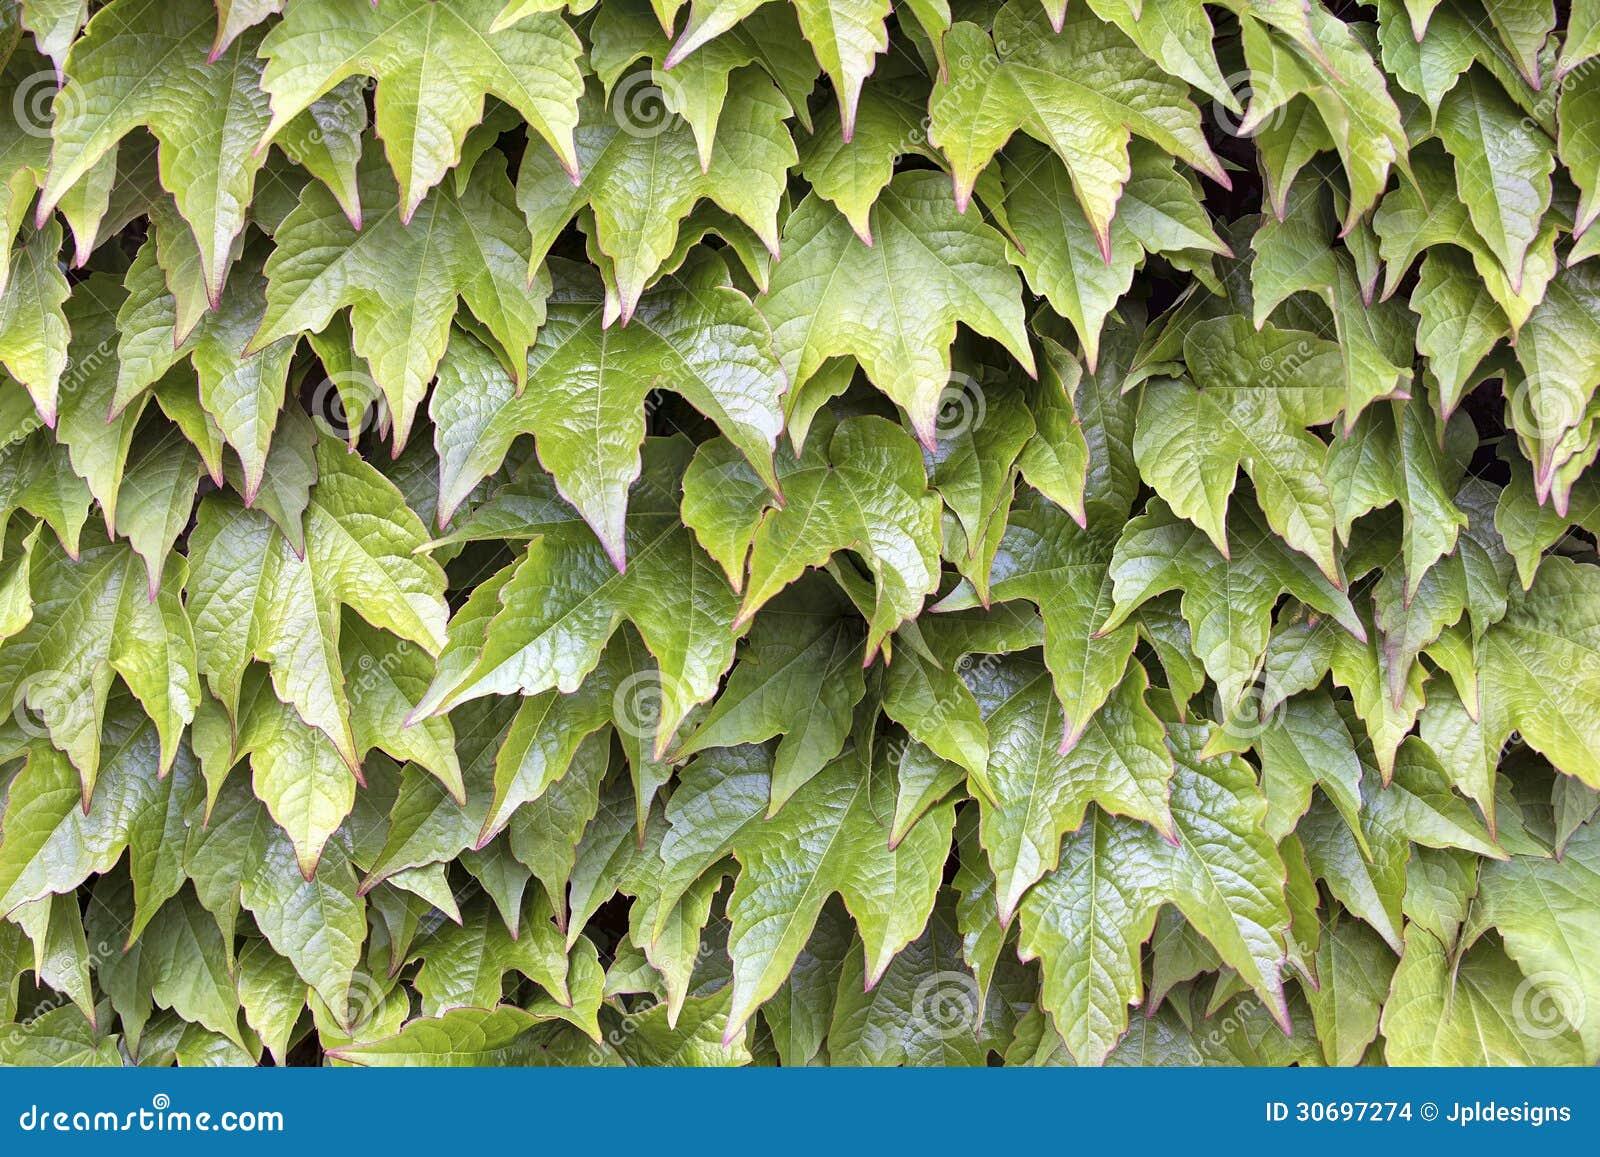 Boston Ivy Climbing Vines Background Stock Images